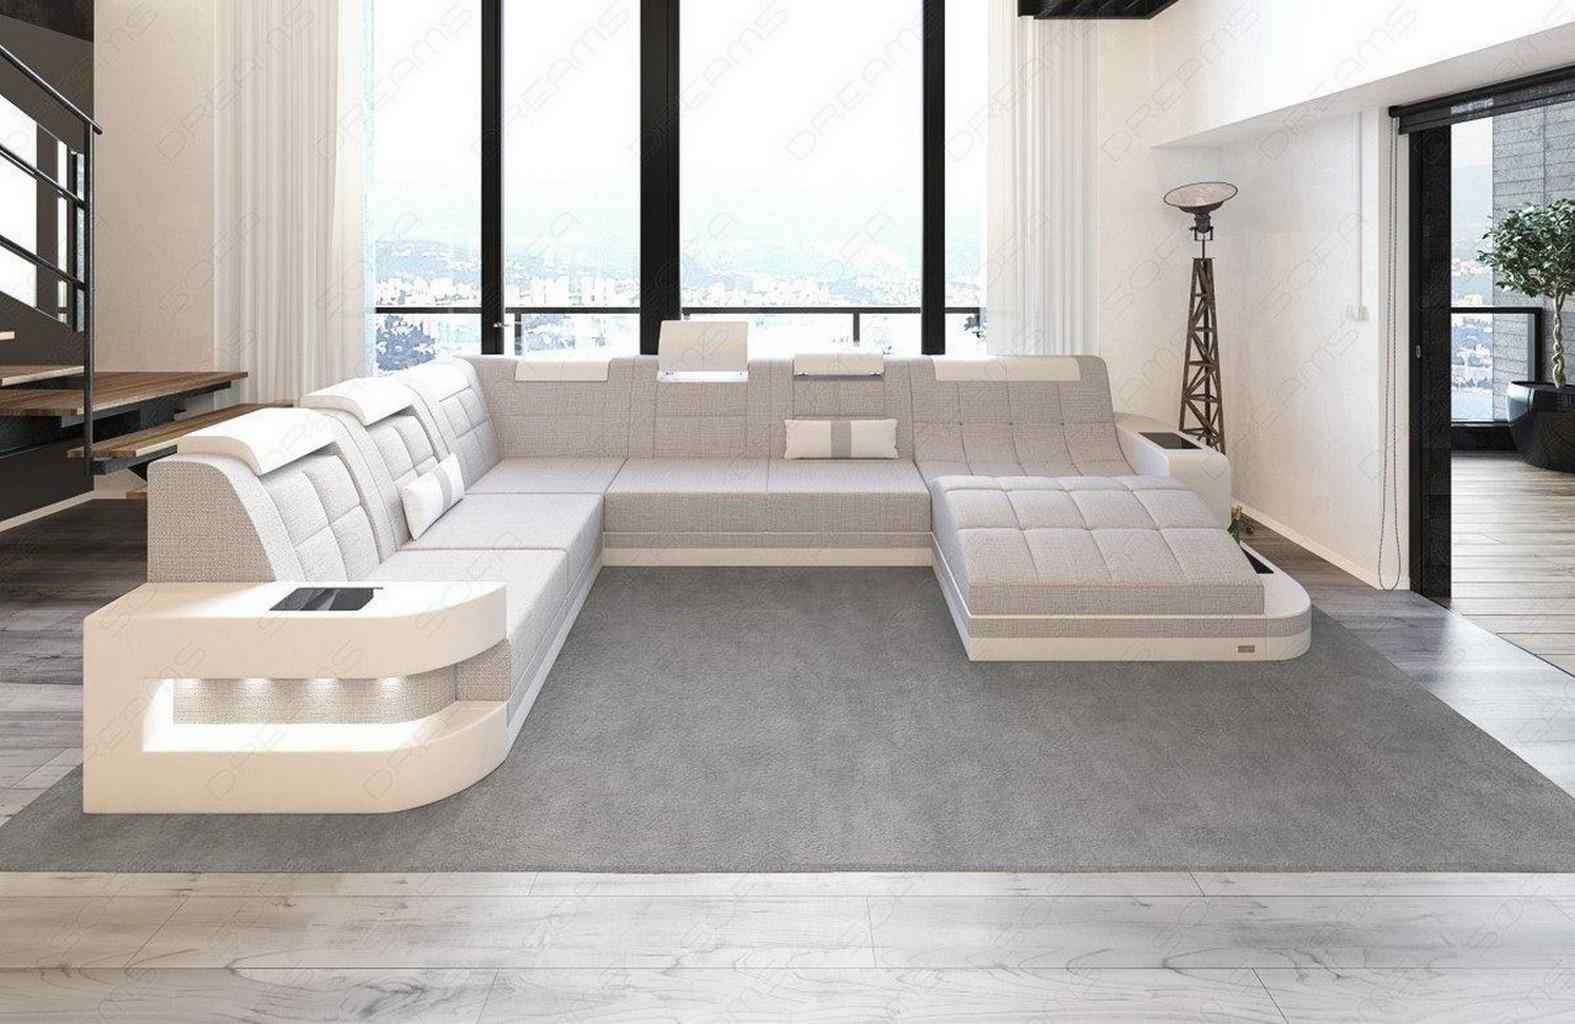 polster couch wohnlandschaft couchgarnitur wave xl sand led stoff sofa modern ebay. Black Bedroom Furniture Sets. Home Design Ideas